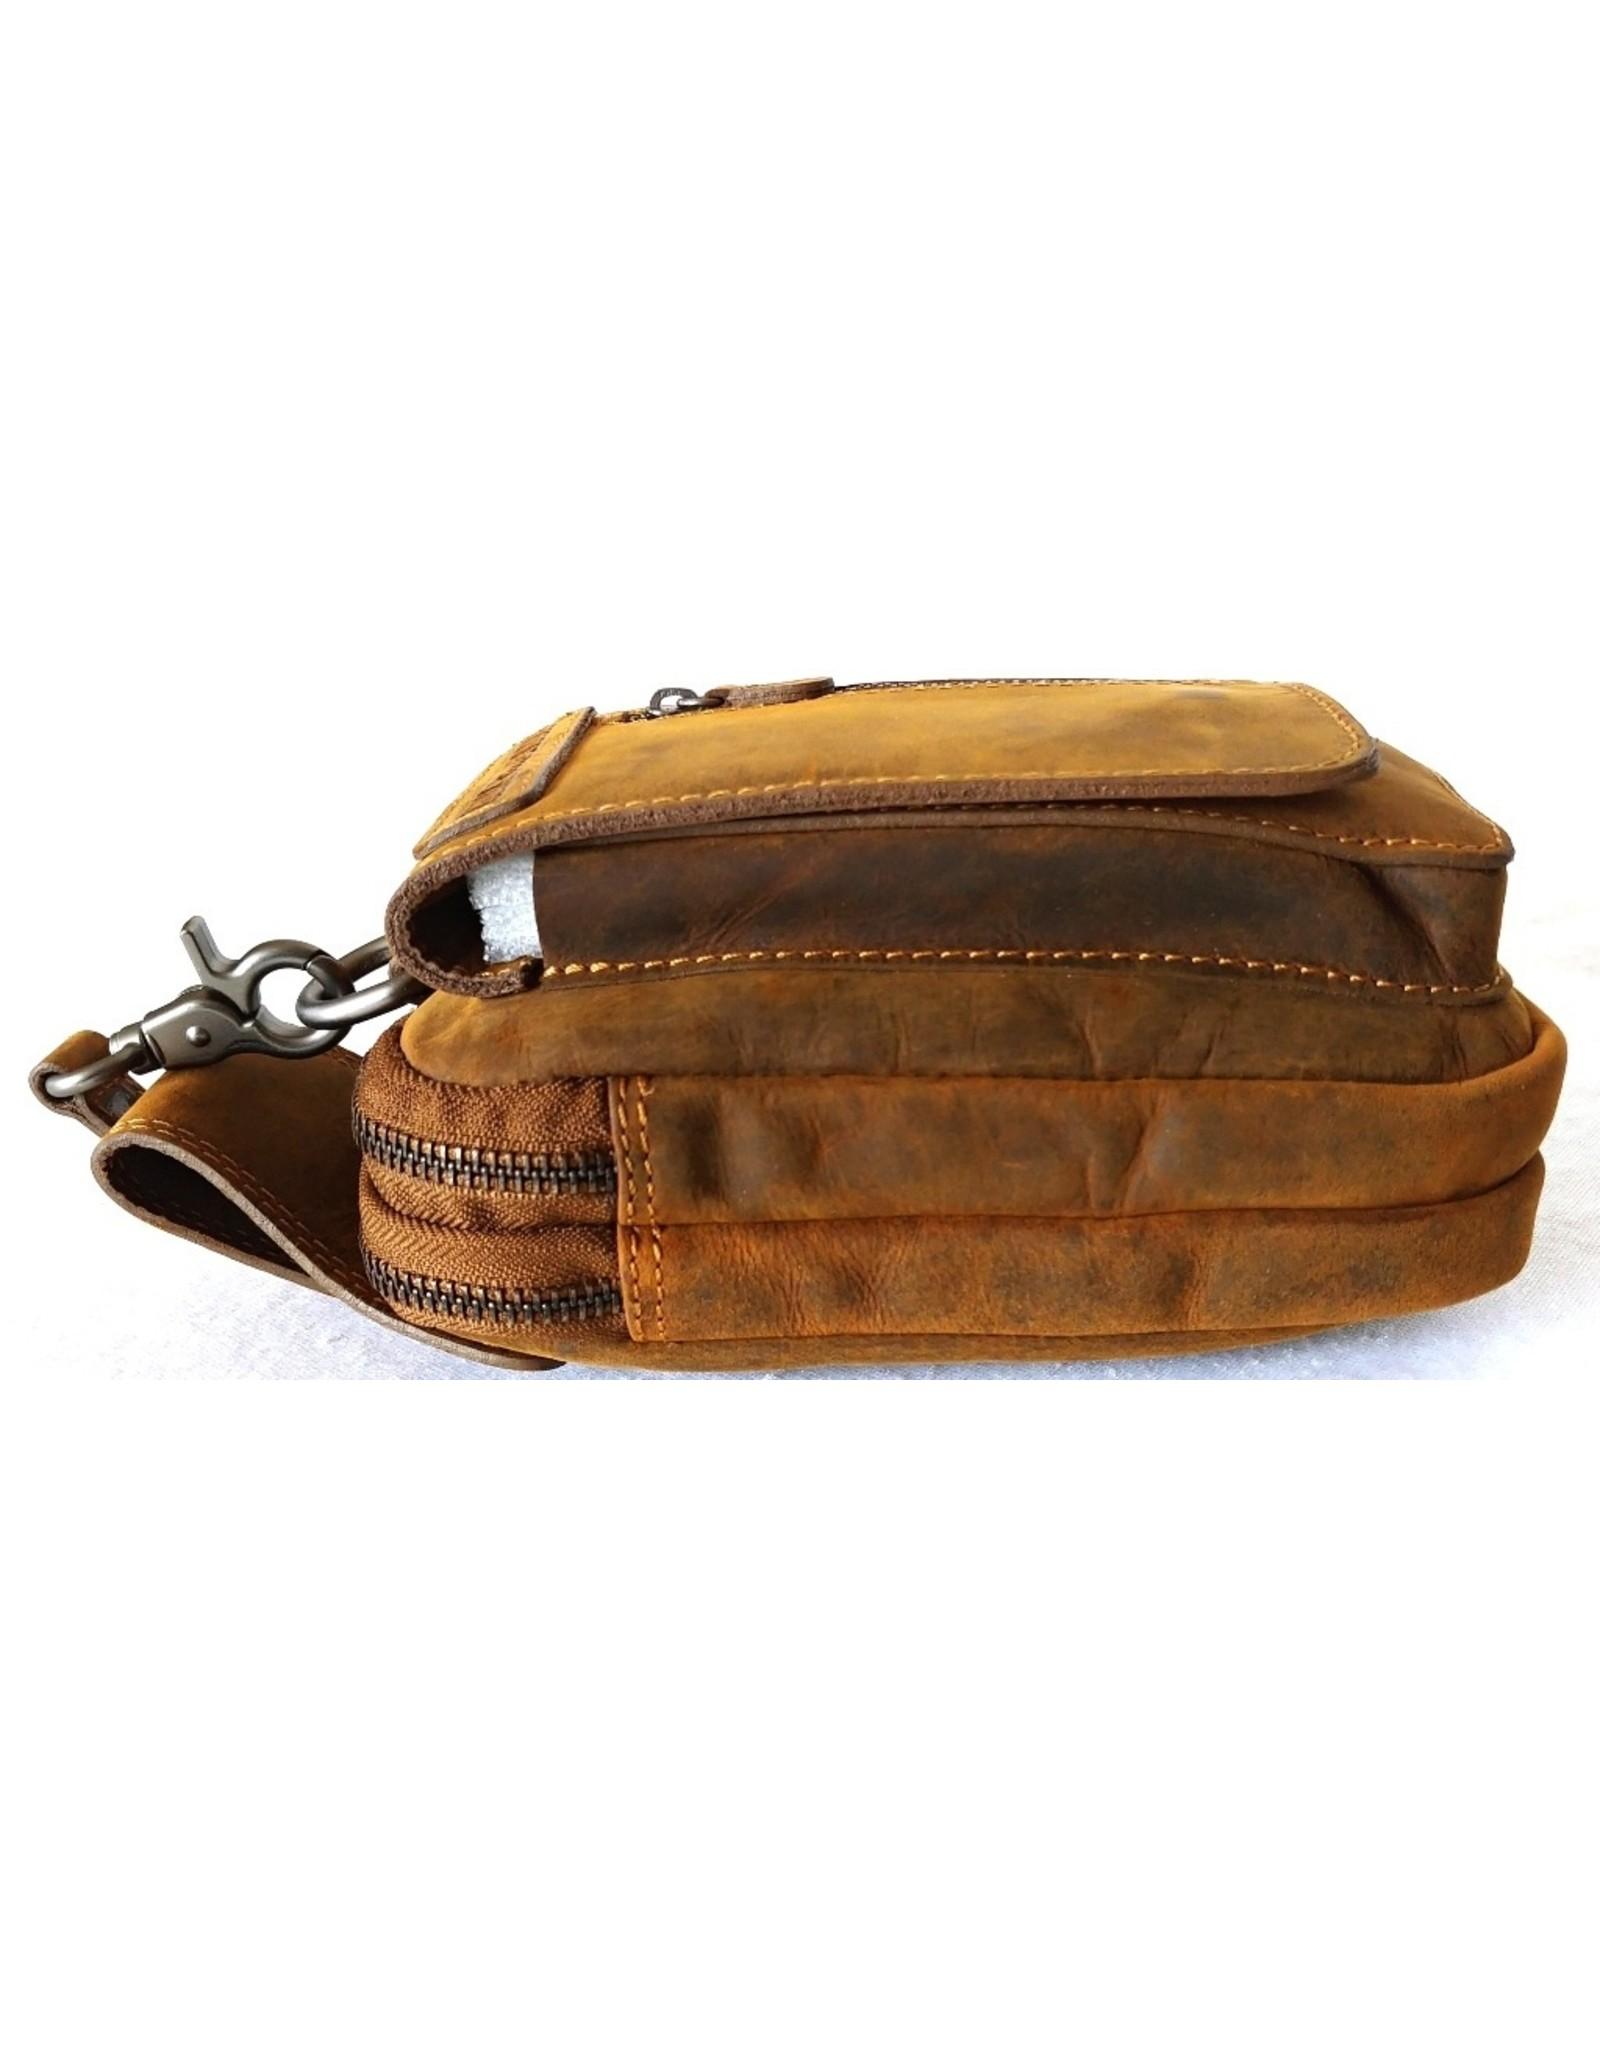 HillBurry Leather festival bags, waist bags - Hillburry Leather Belt Bag Brown (Buffalo leather)